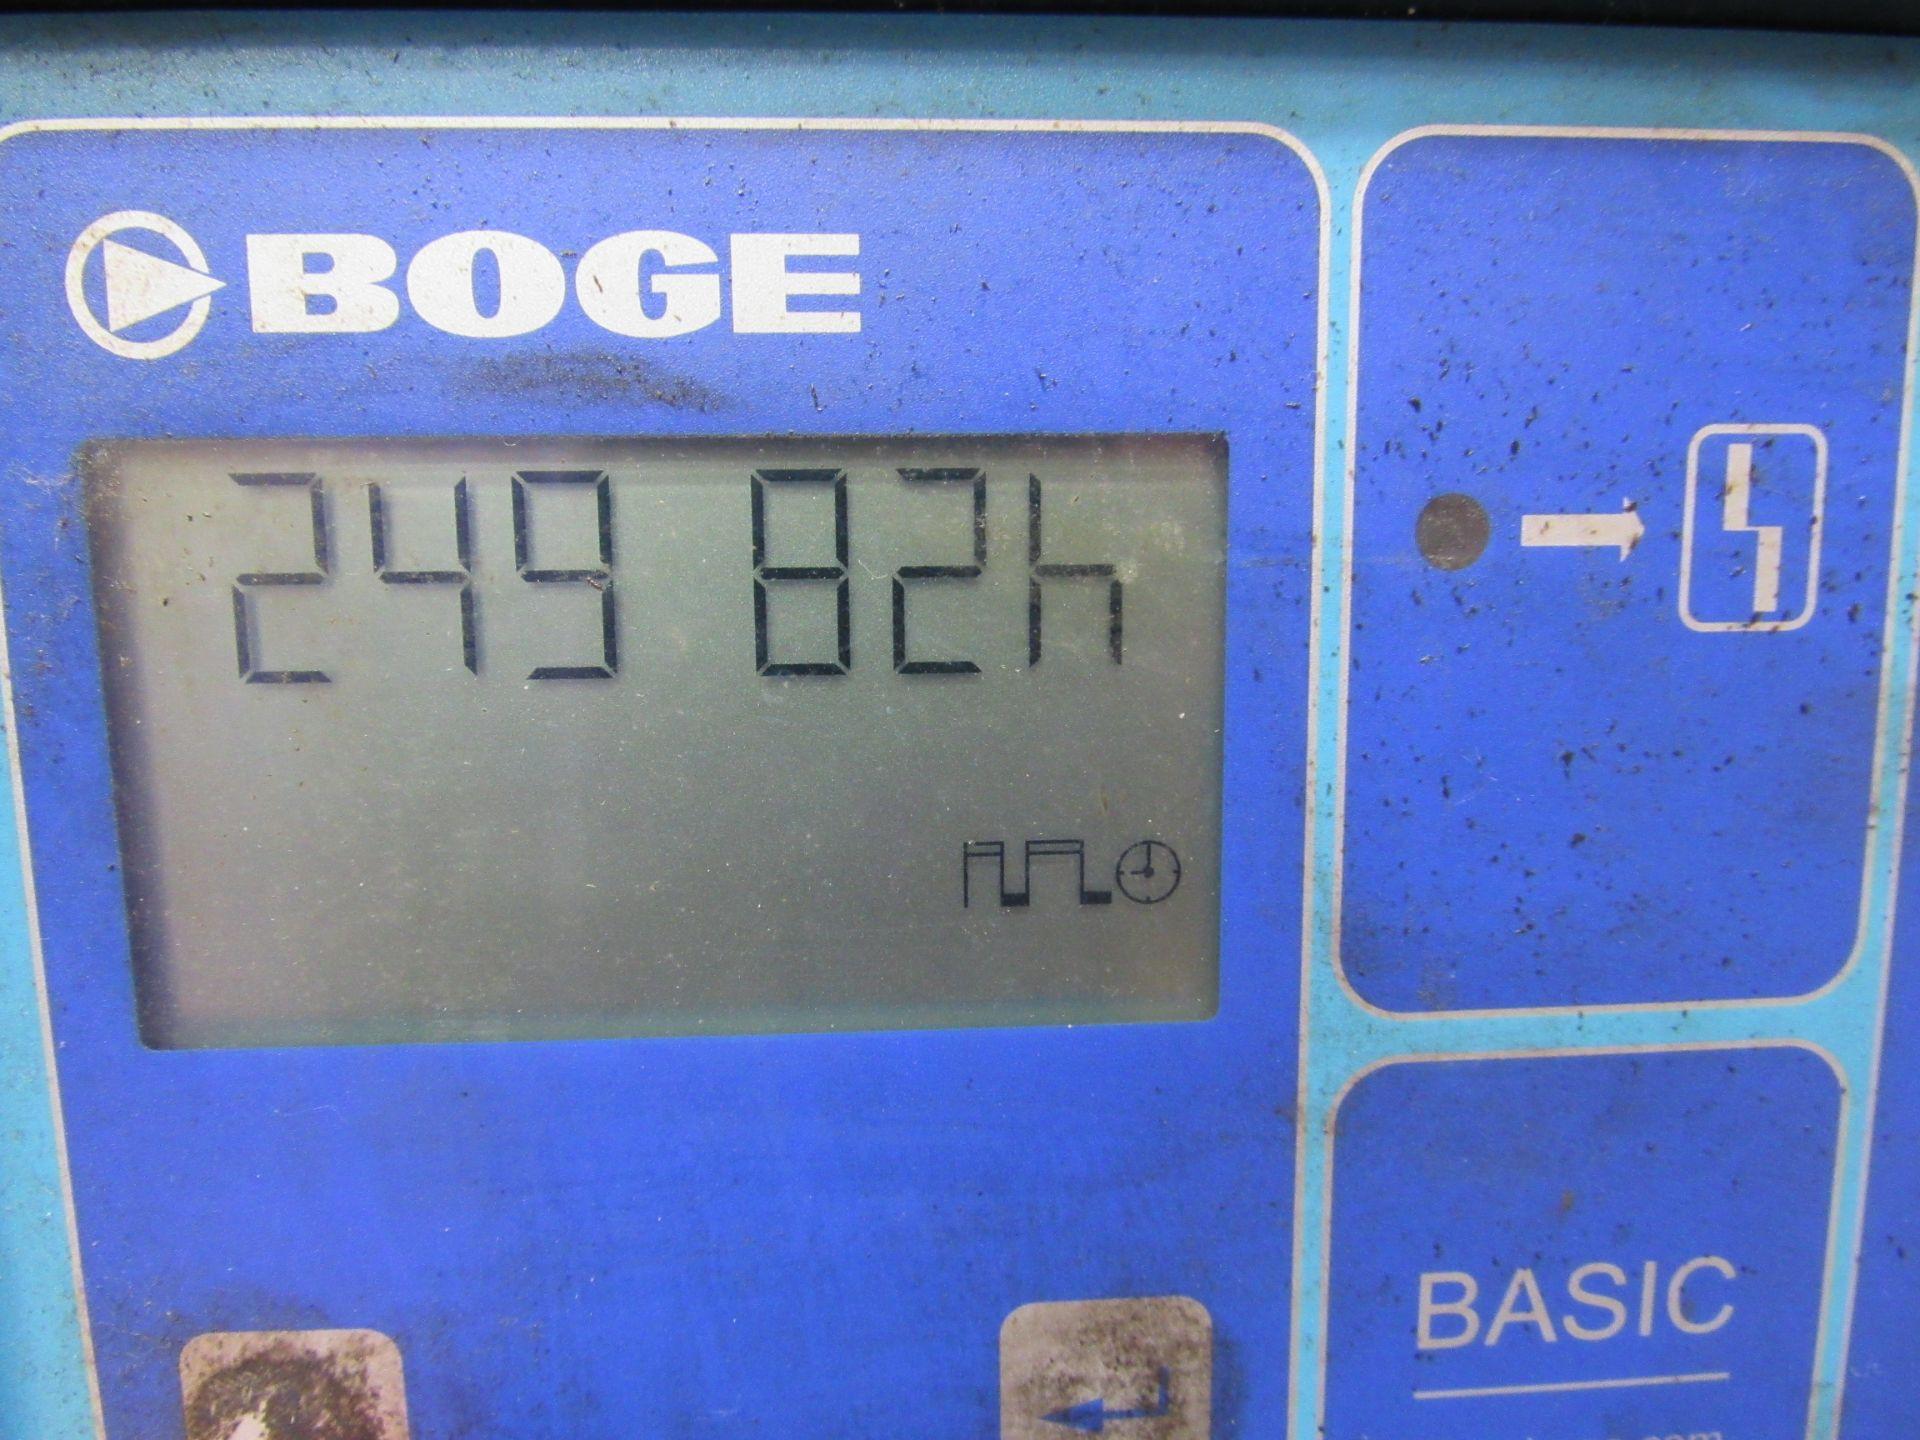 Boge 515 30,503 Hours, 24,892 Hours, 2797 Hours, Serial Number 560123 - Image 4 of 5